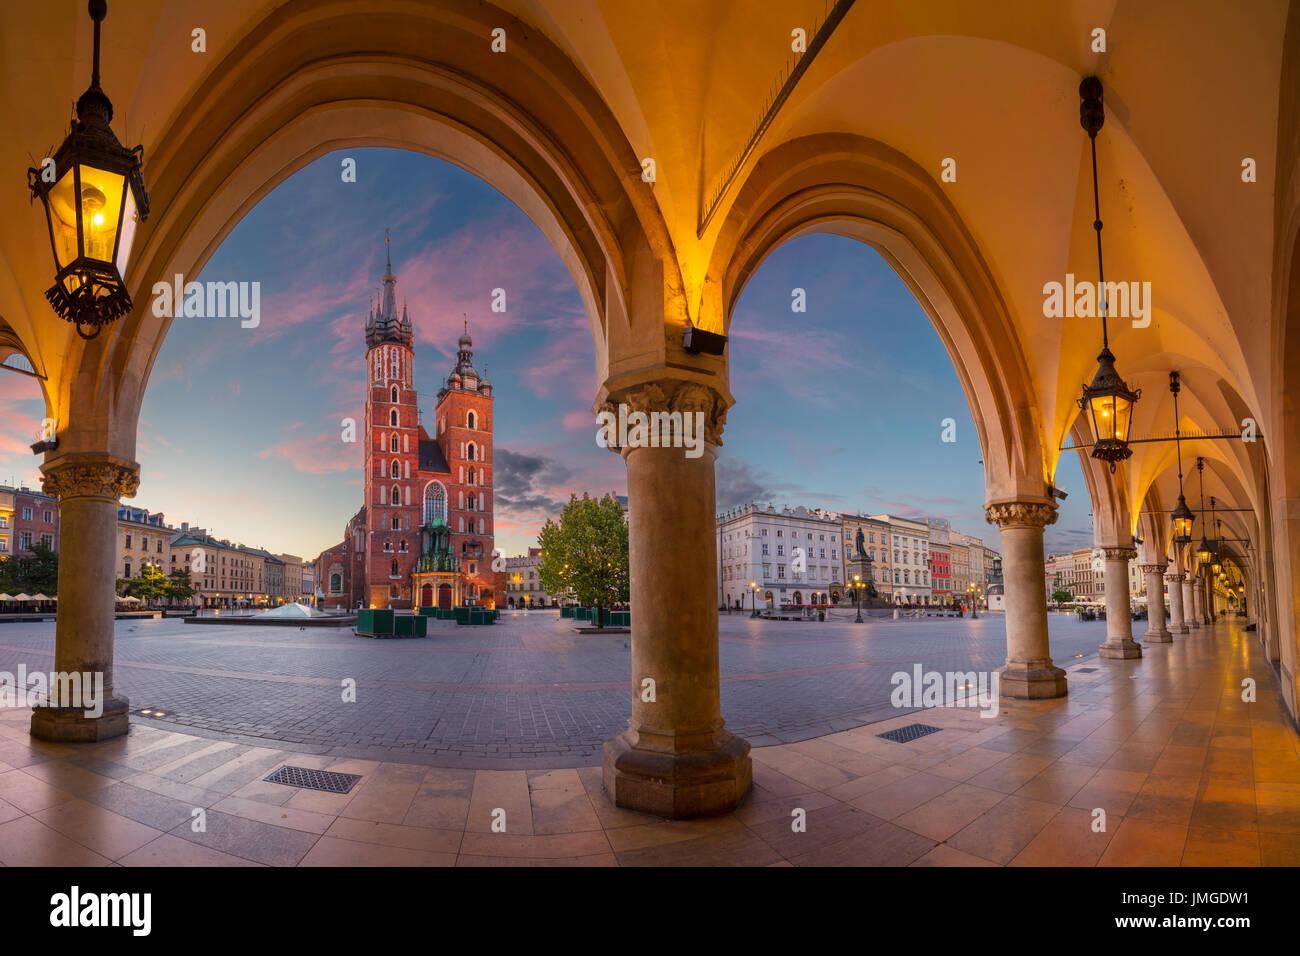 Krakau. Bild des Krakauer Marktplatz, Polen bei Sonnenaufgang. Stockbild